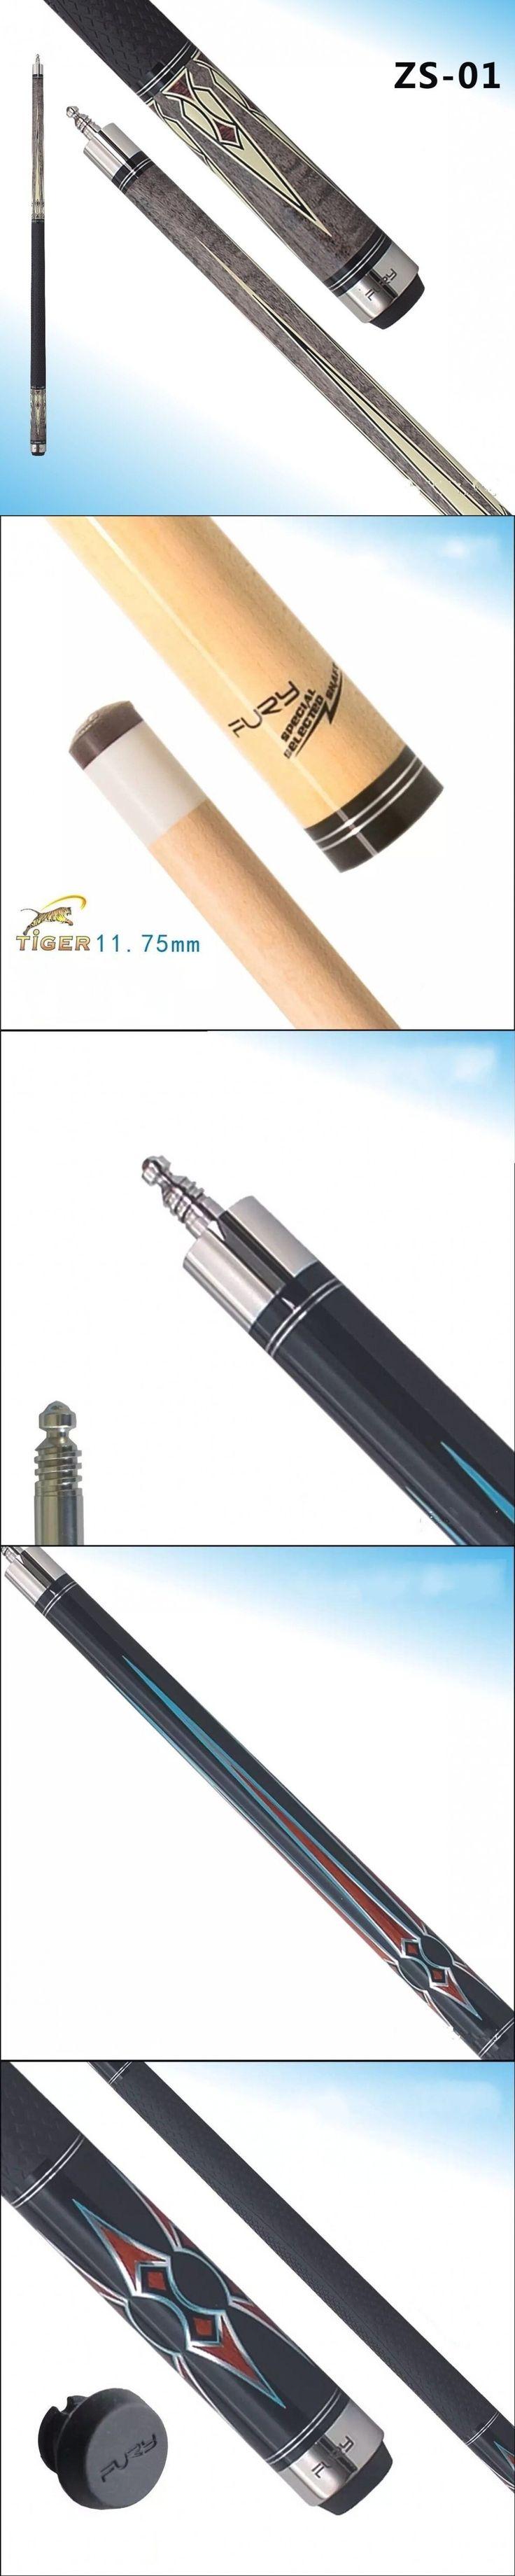 Fury Pool Cue Model ZS-01 Speed-Loc joint pin 11.75mmTip pool billiards cue tacos de billar Silicone sport grip